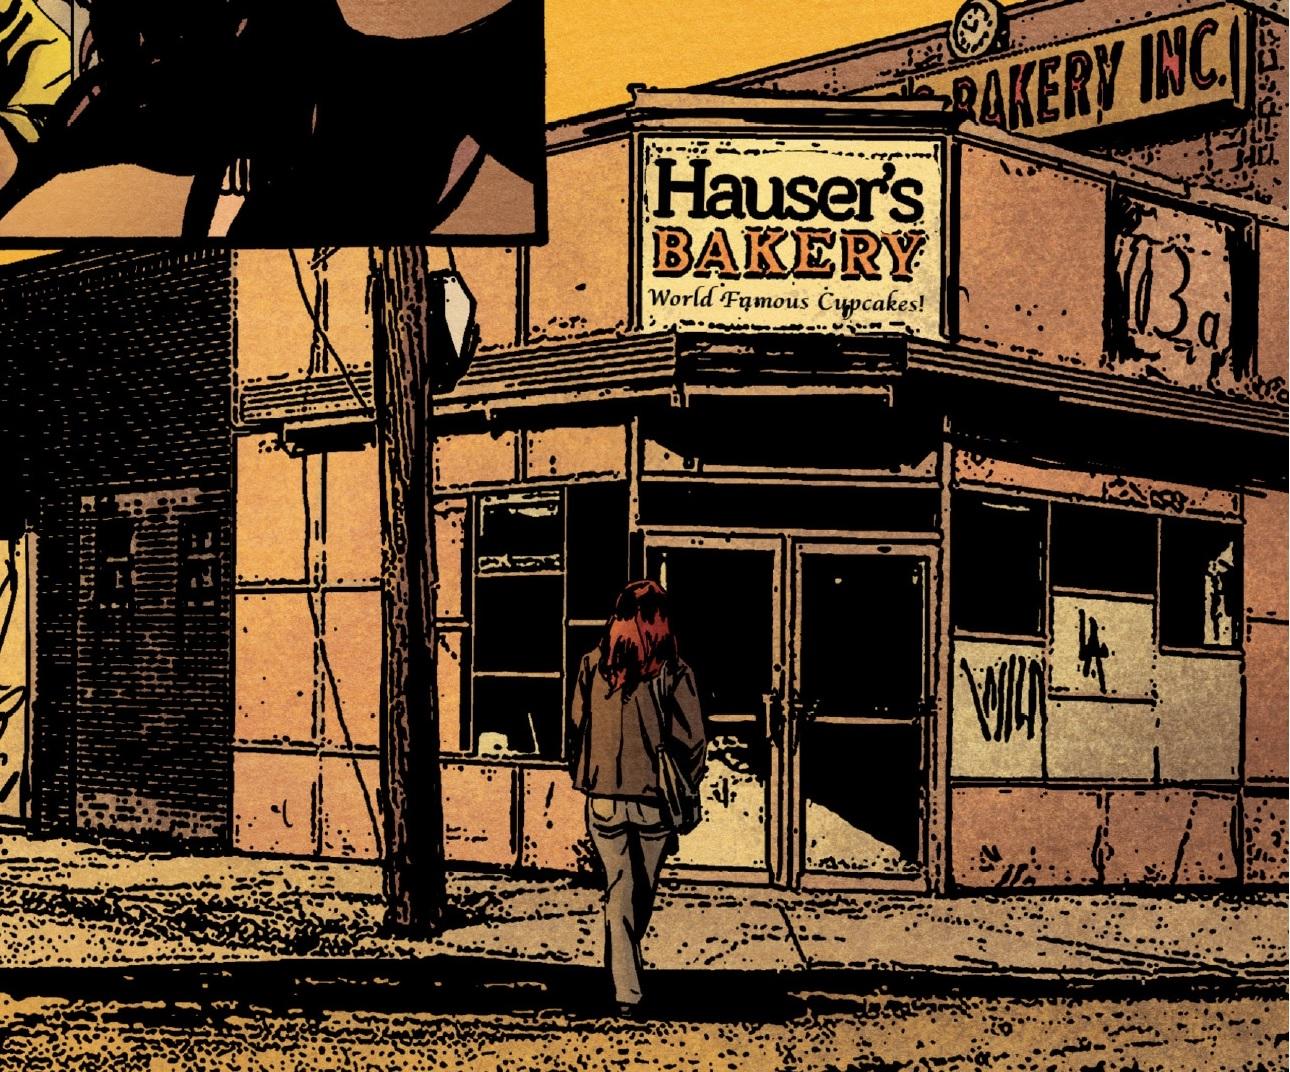 Hauser's Bakery/Gallery